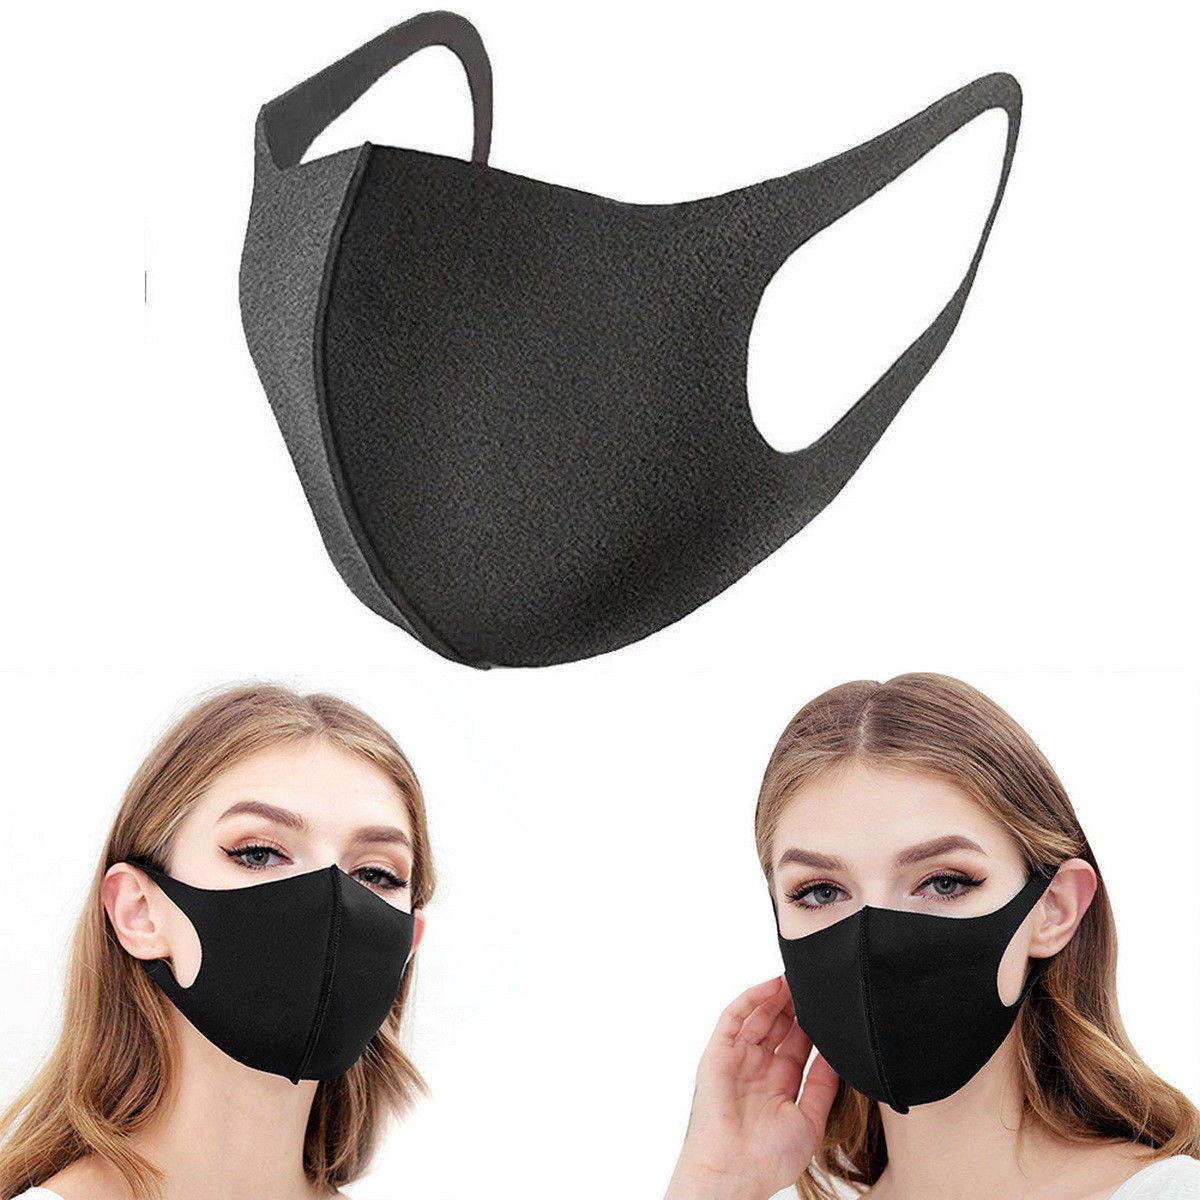 120 black surgical mask